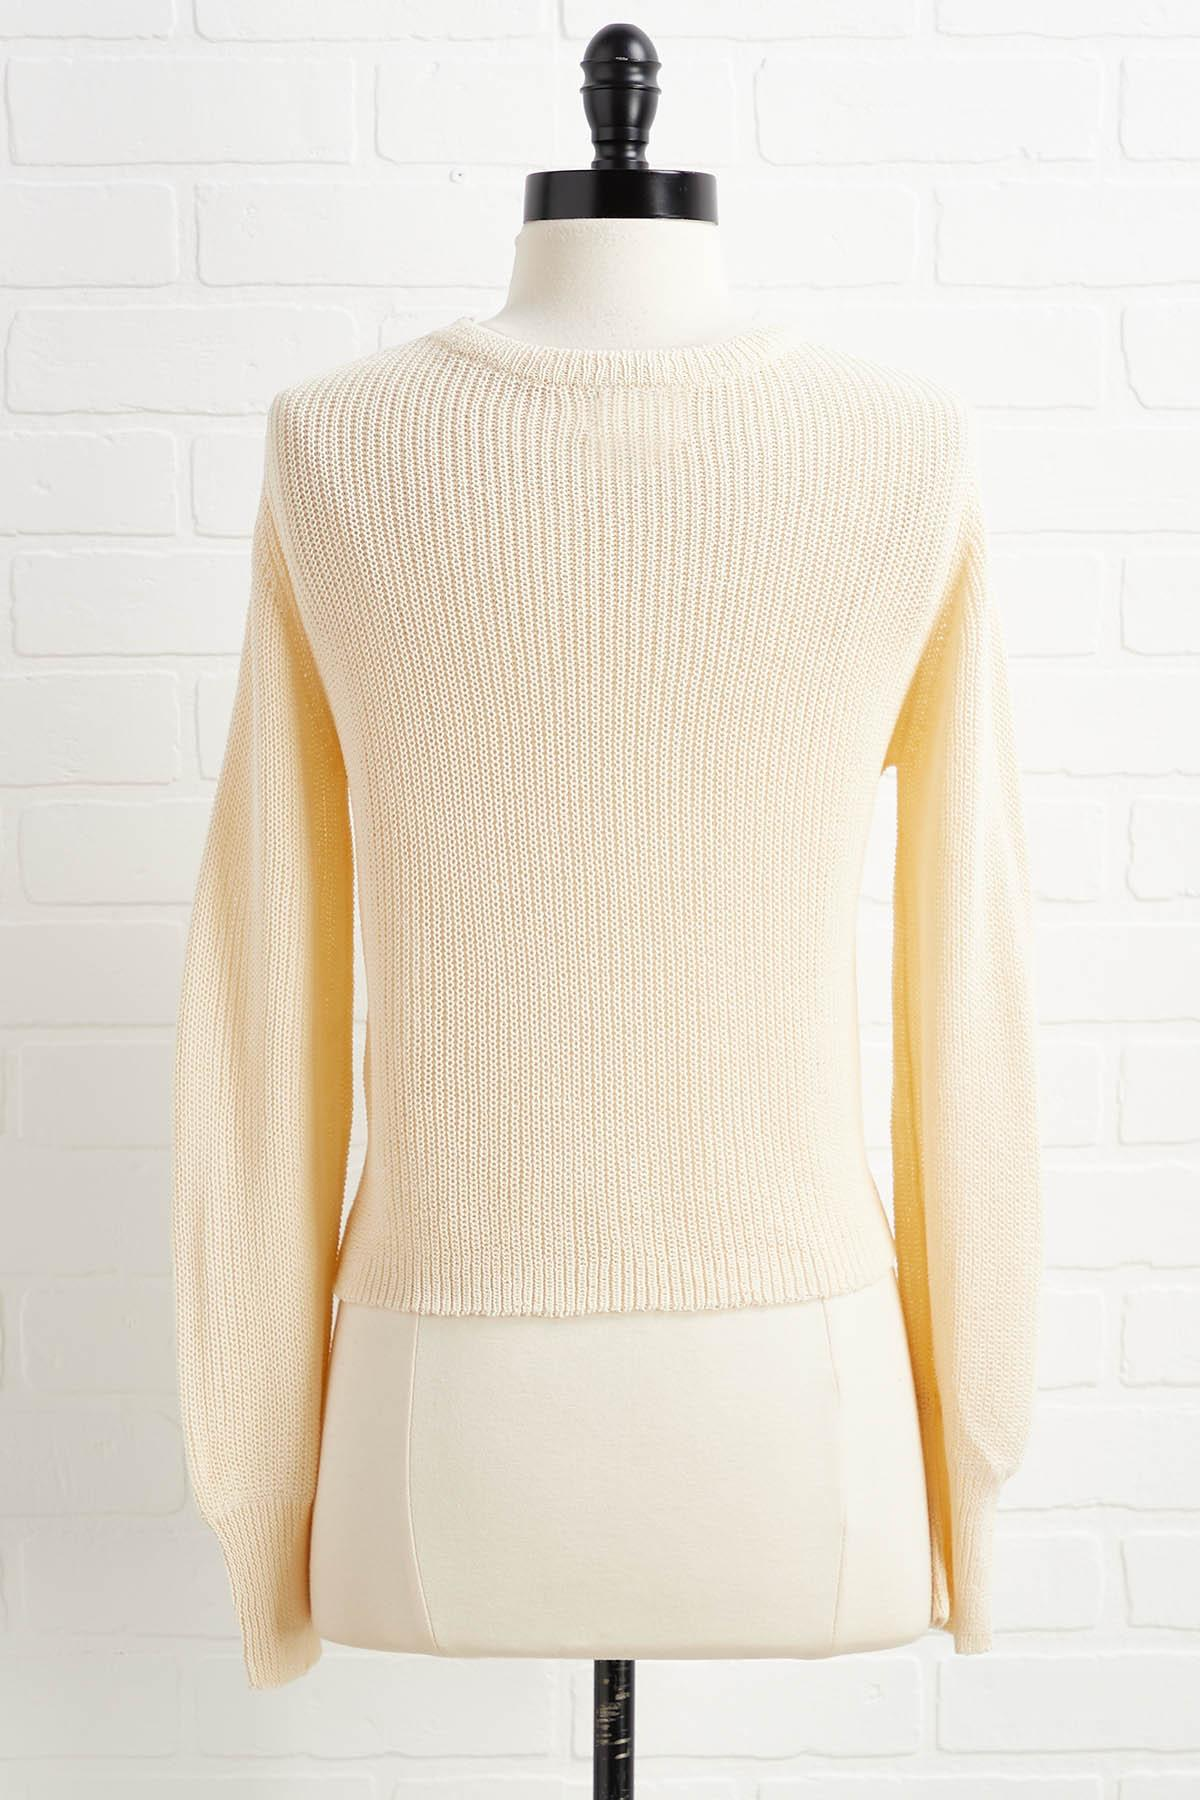 Half The Problem Sweater